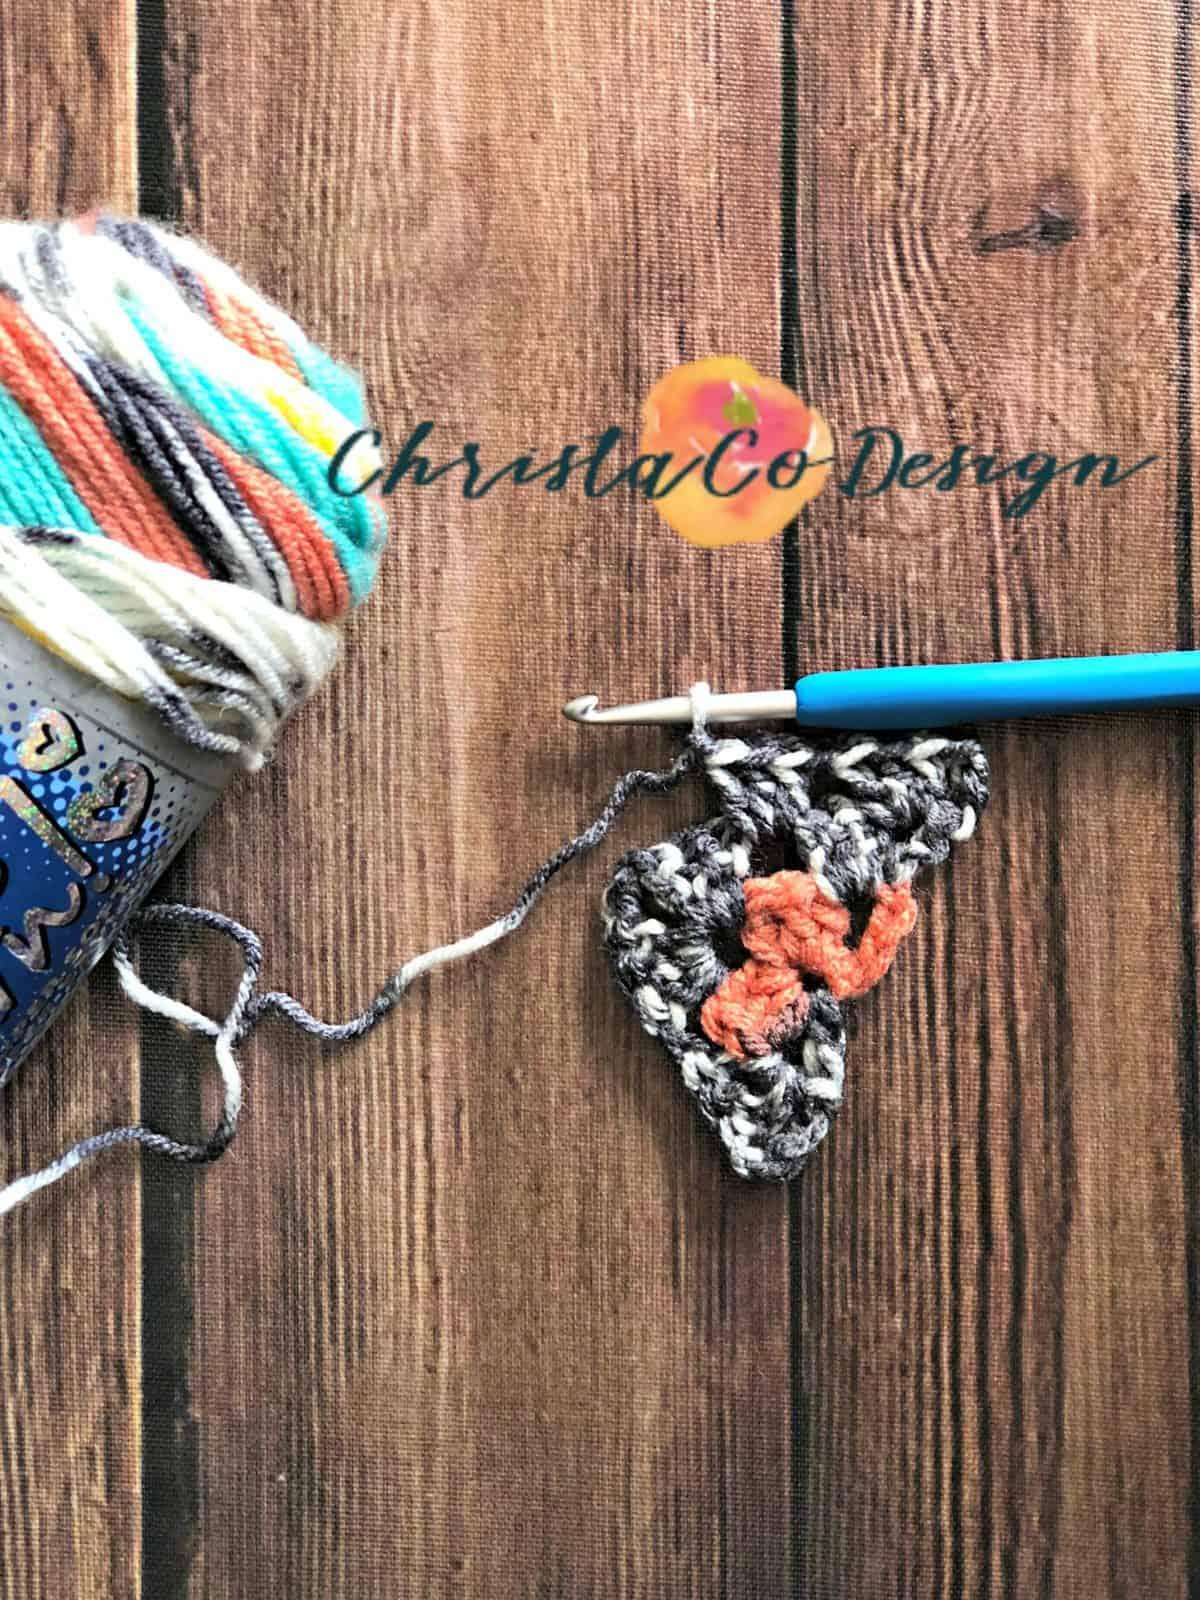 3 double crochet in chain 1 space.